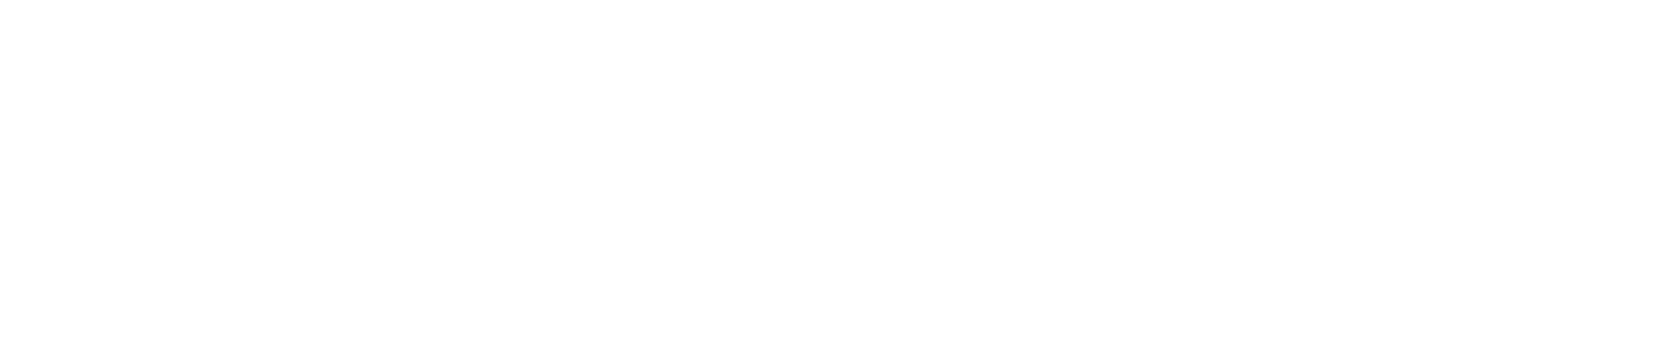 Grayslaw